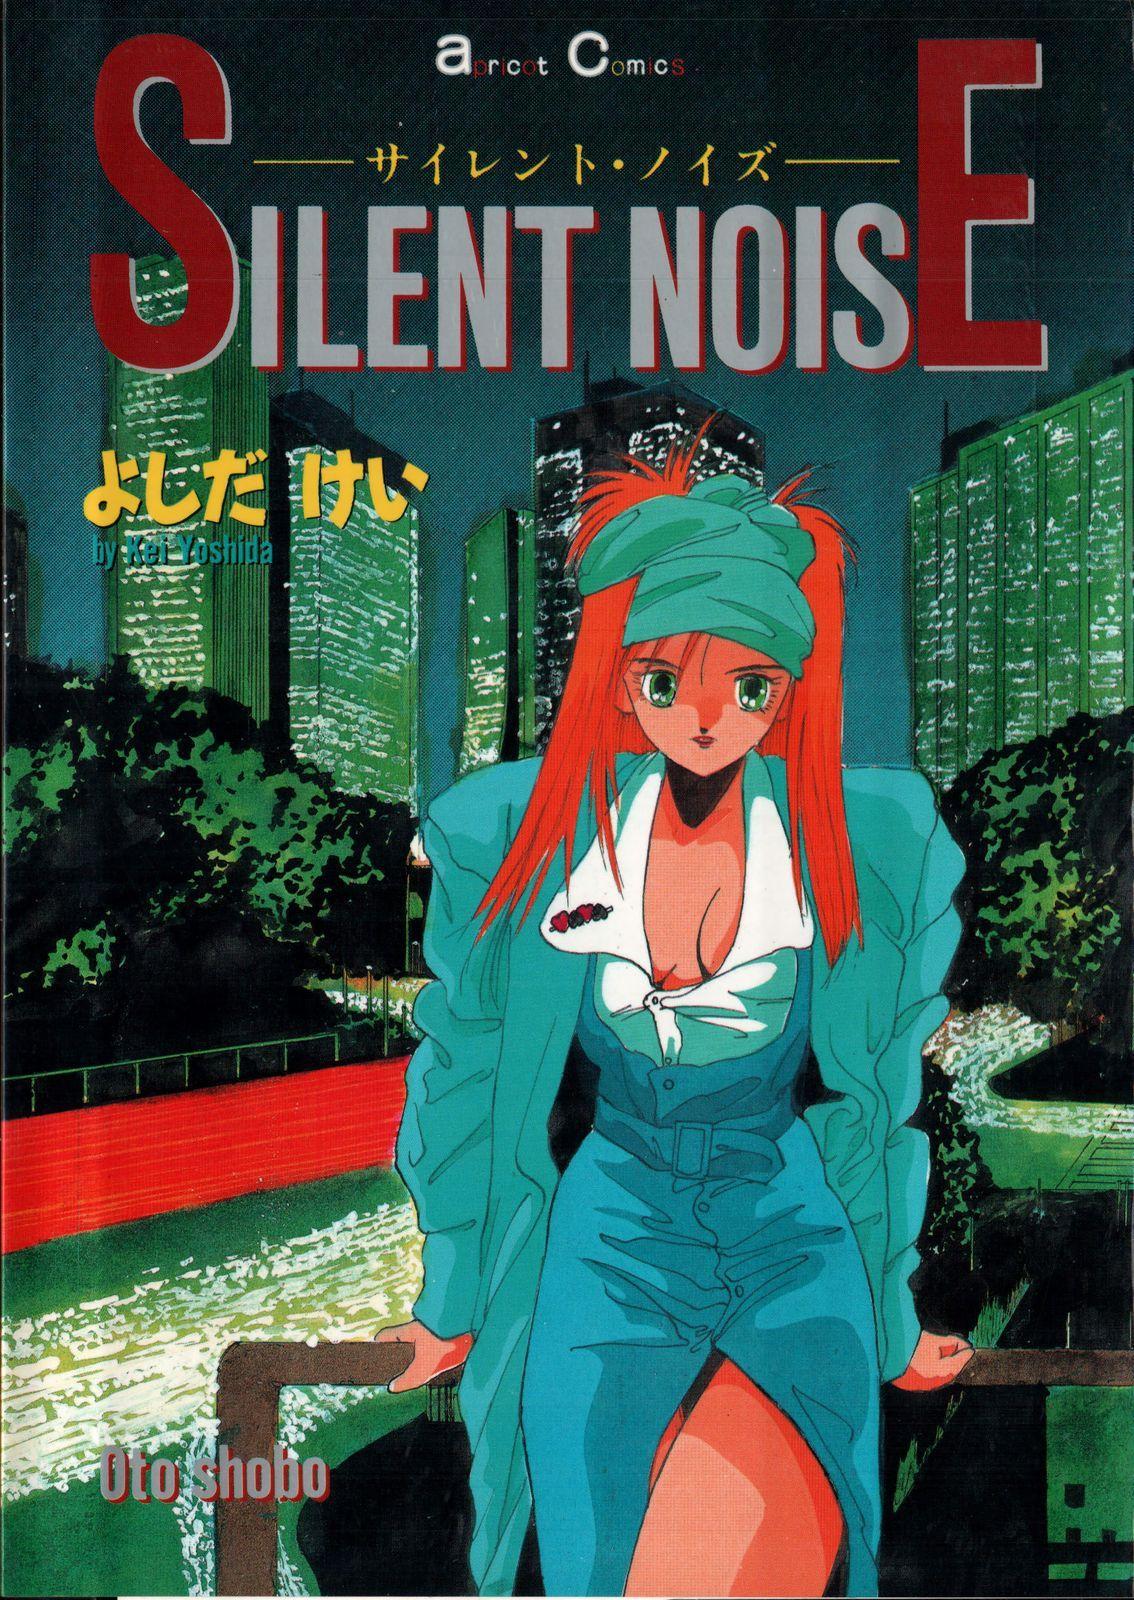 SILENT NOISE 0